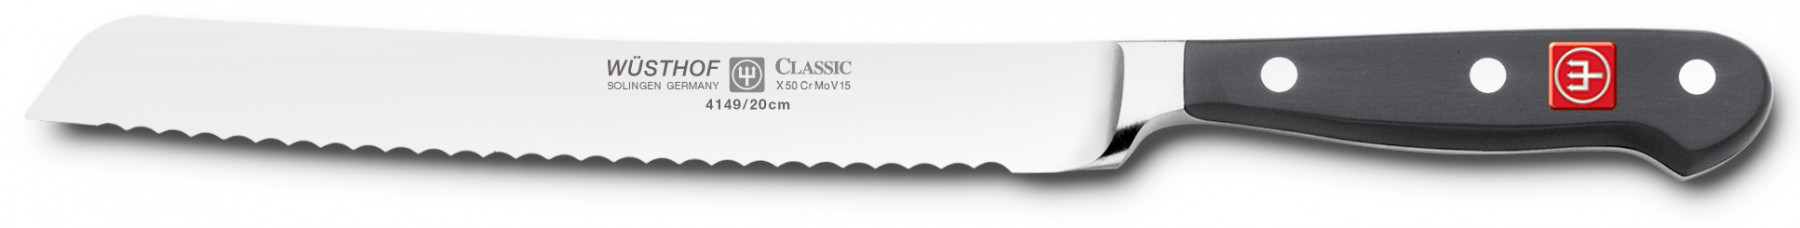 Wüsthof Dreizack Messergarnitur Classic 5tlg. Brotmesser